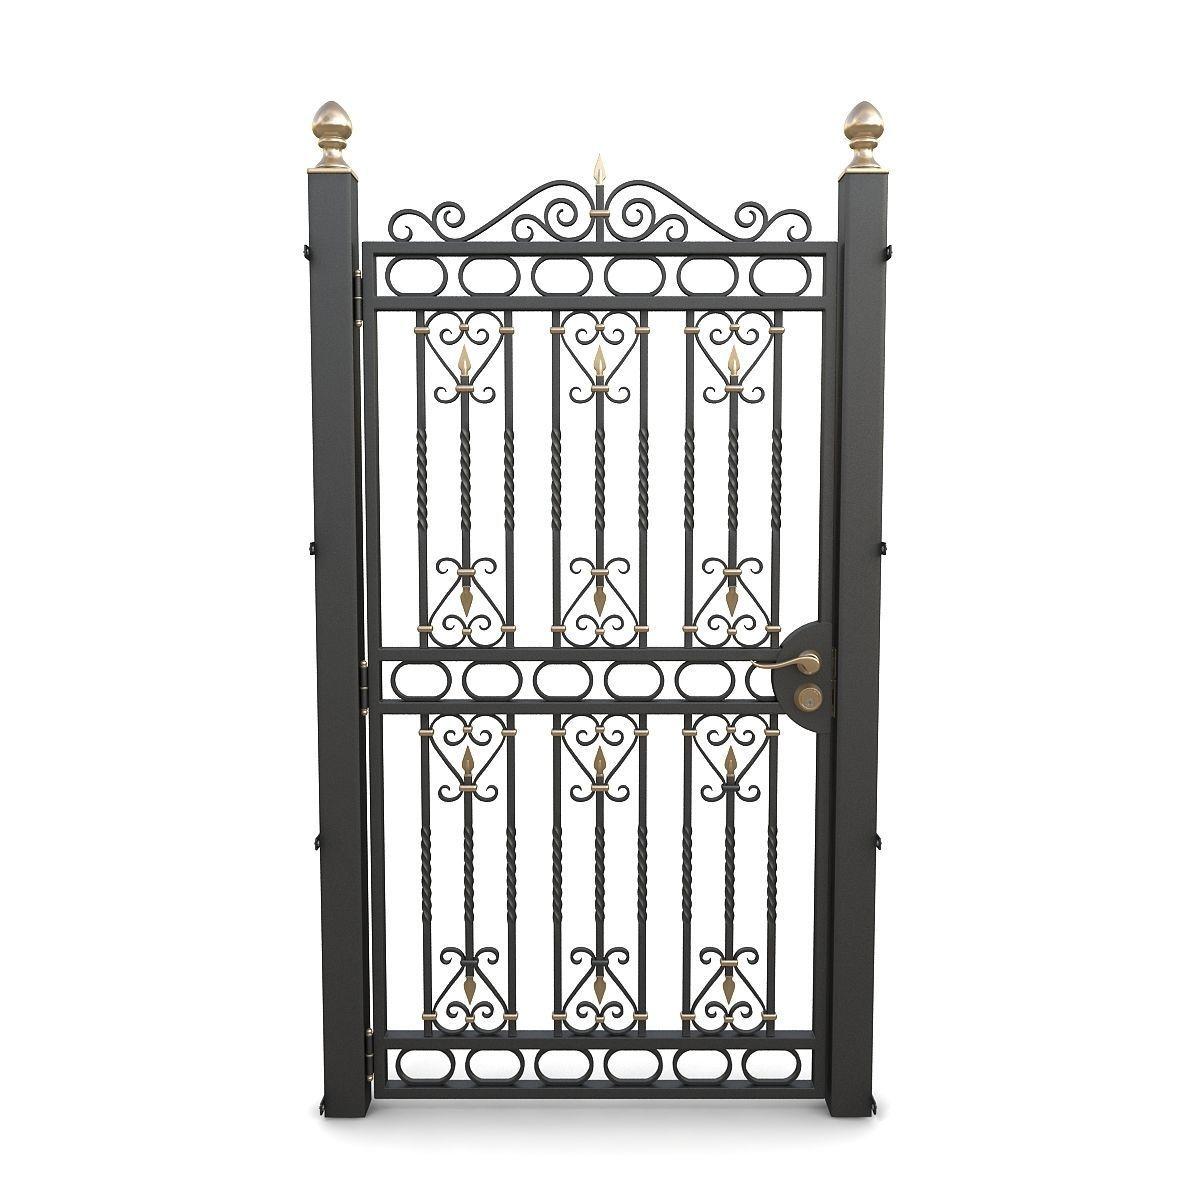 Wrought iron gate 03